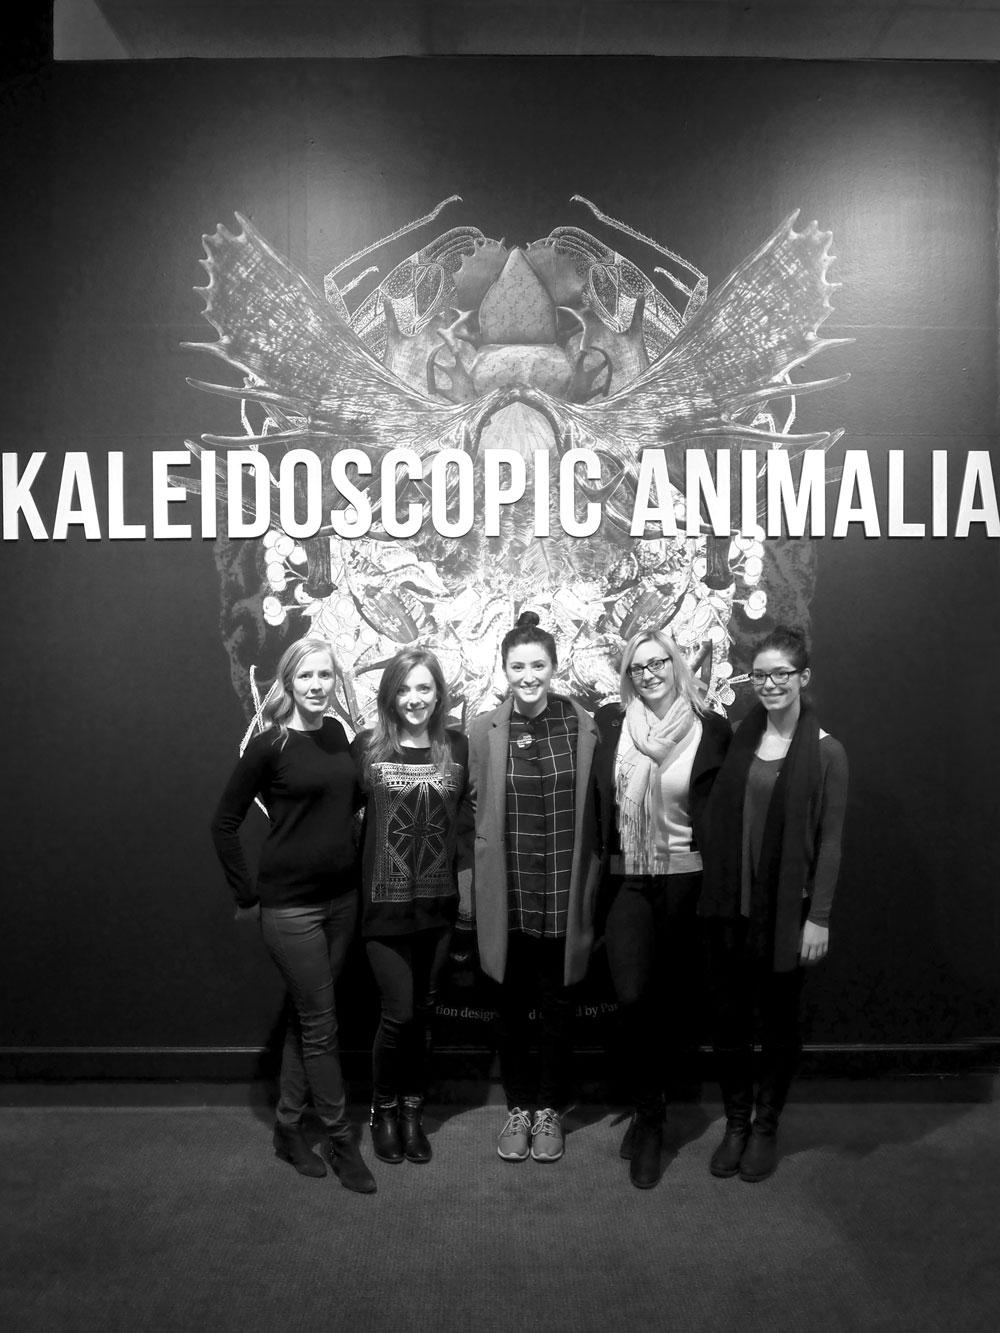 kaleidoscopic.jpg